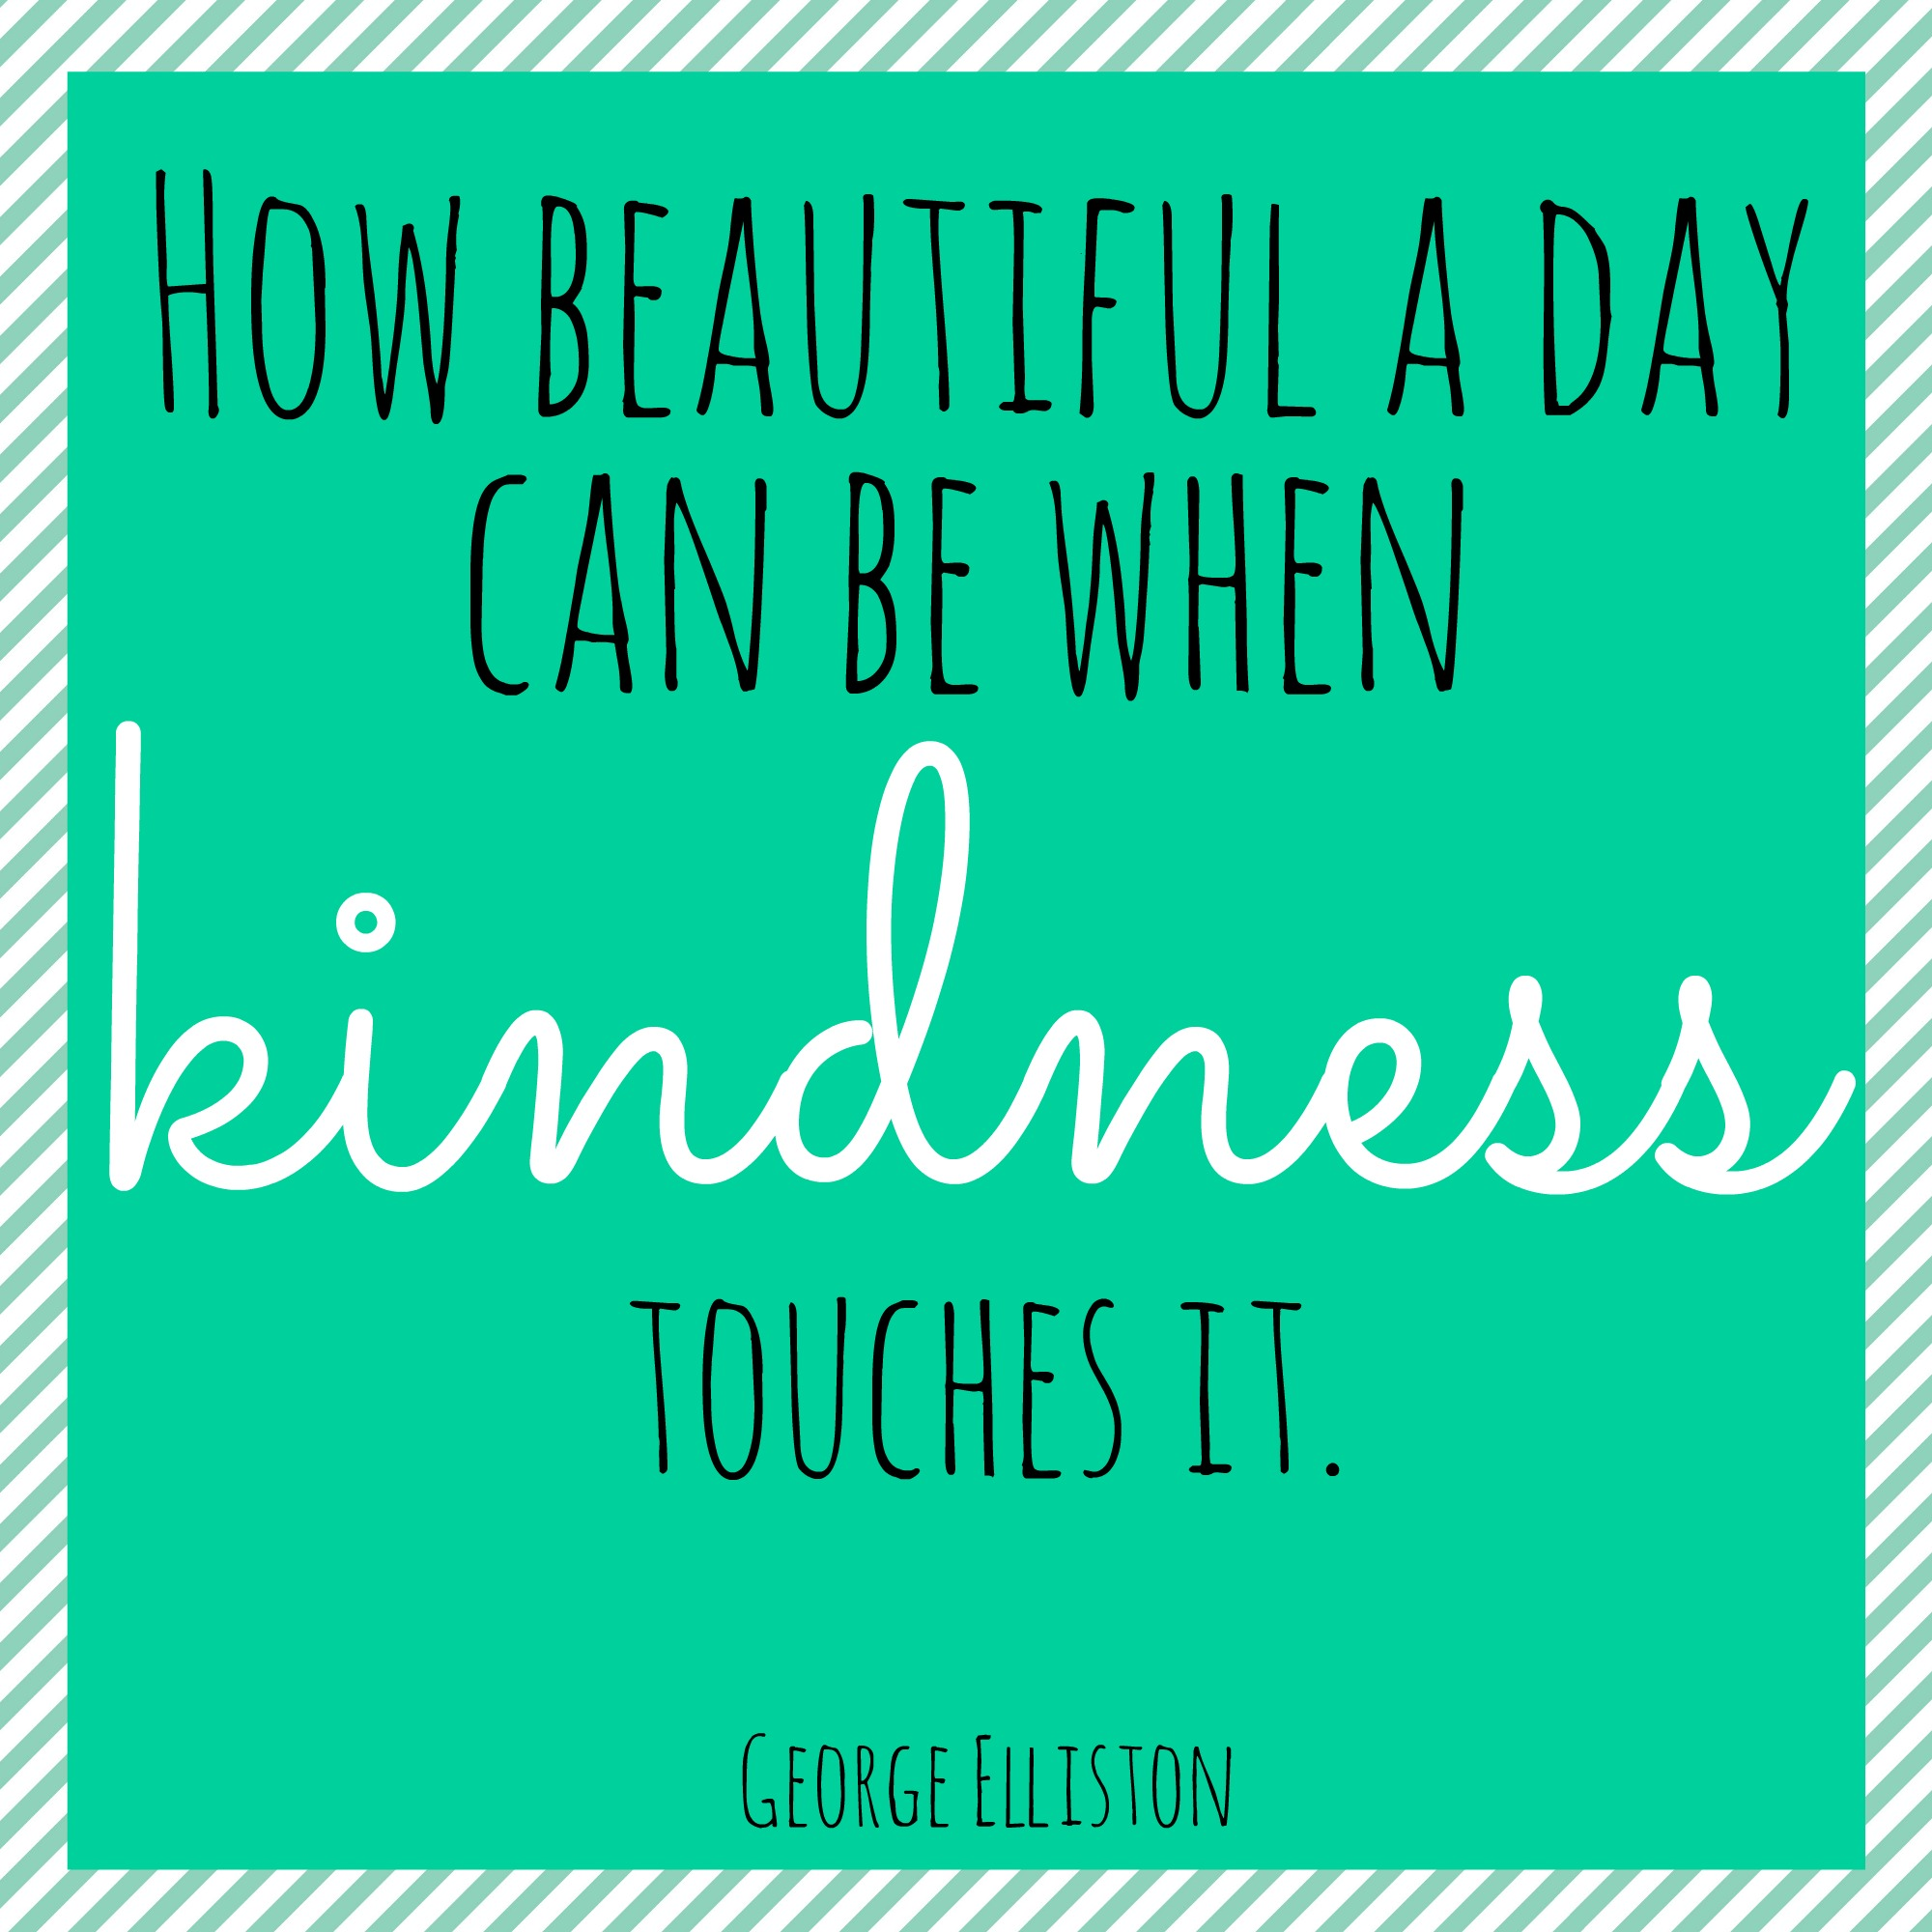 100 Days of Kindness Ideas 21-40